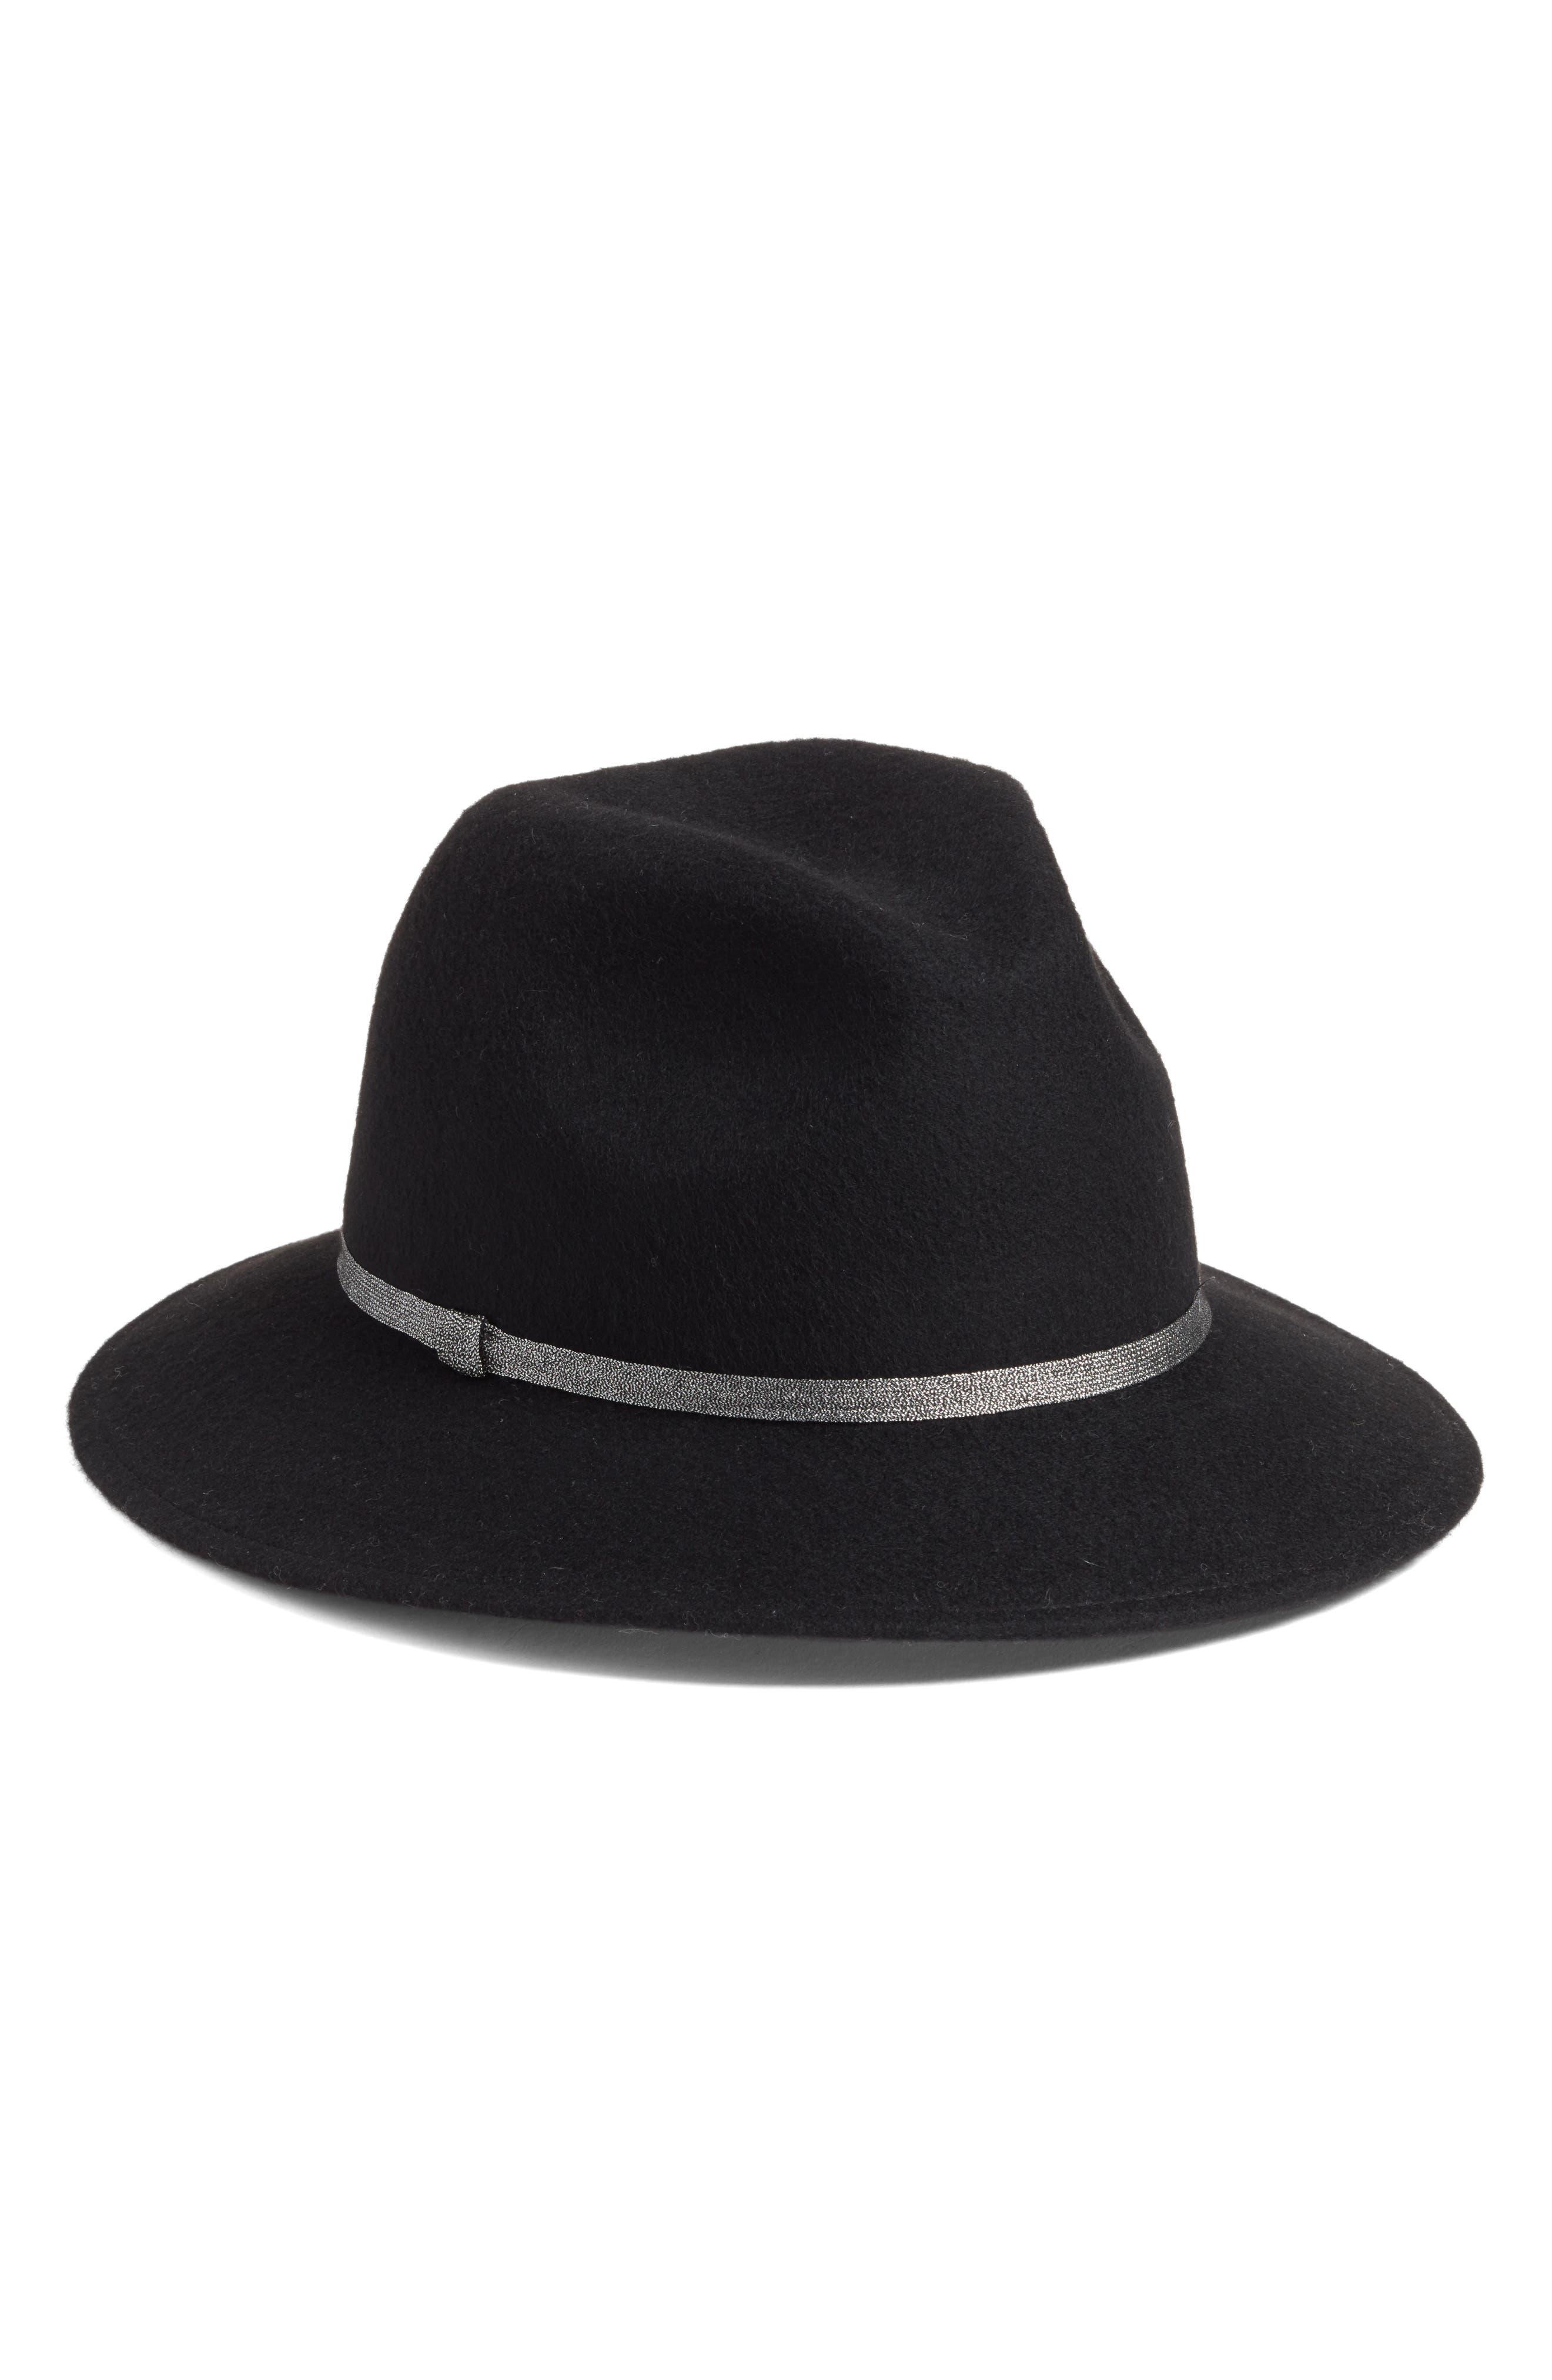 Metallic Band Wool Felt Panama Hat,                             Main thumbnail 1, color,                             BLACK